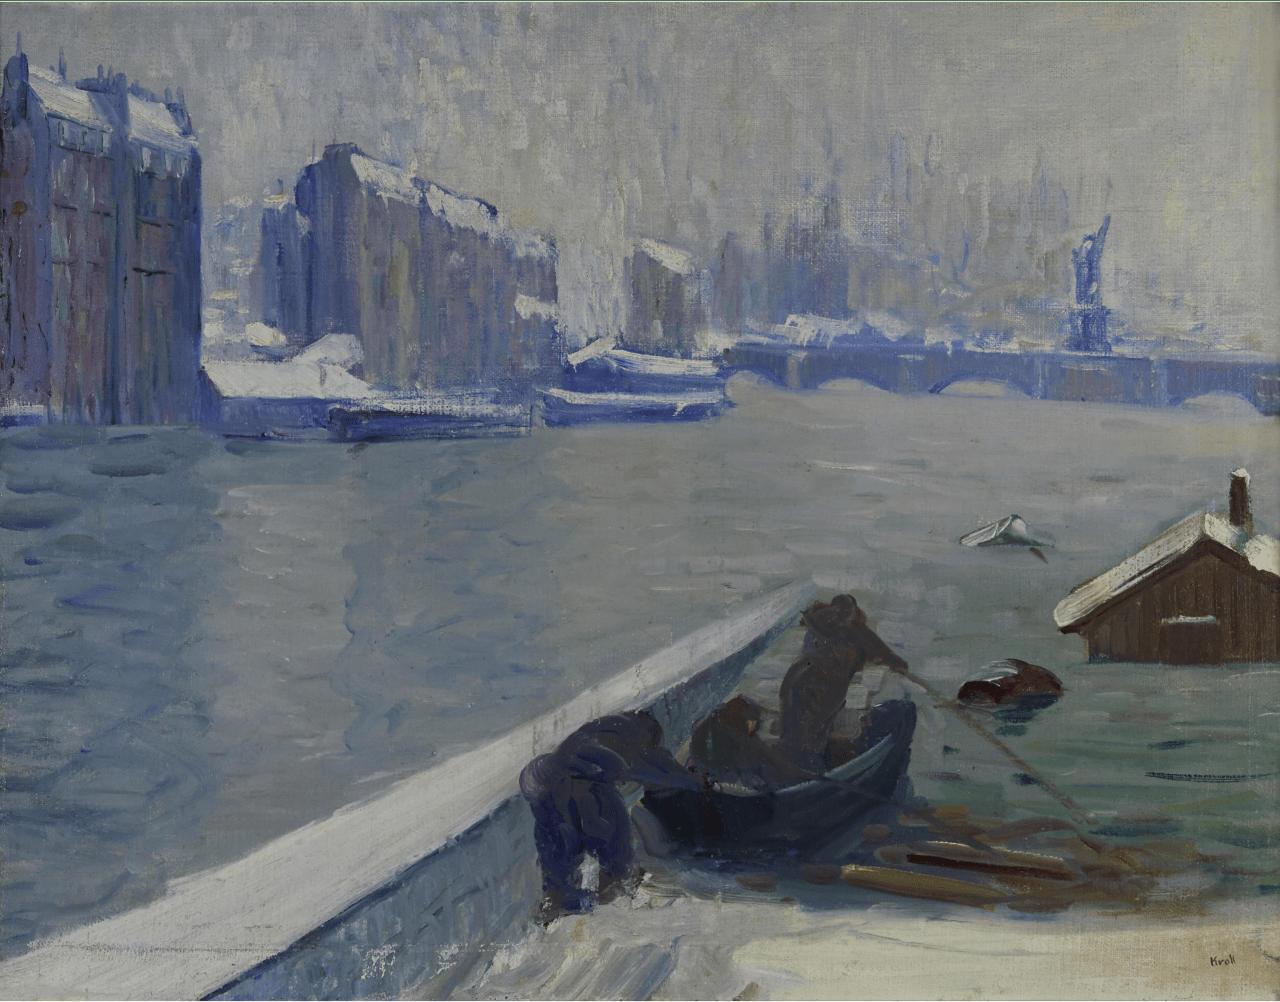 thunderstruck9: Leon Kroll (American, 1884-1975), Paris, Flooding of the Seine, c.1910. Oil on canvas, 28 x 36 in.